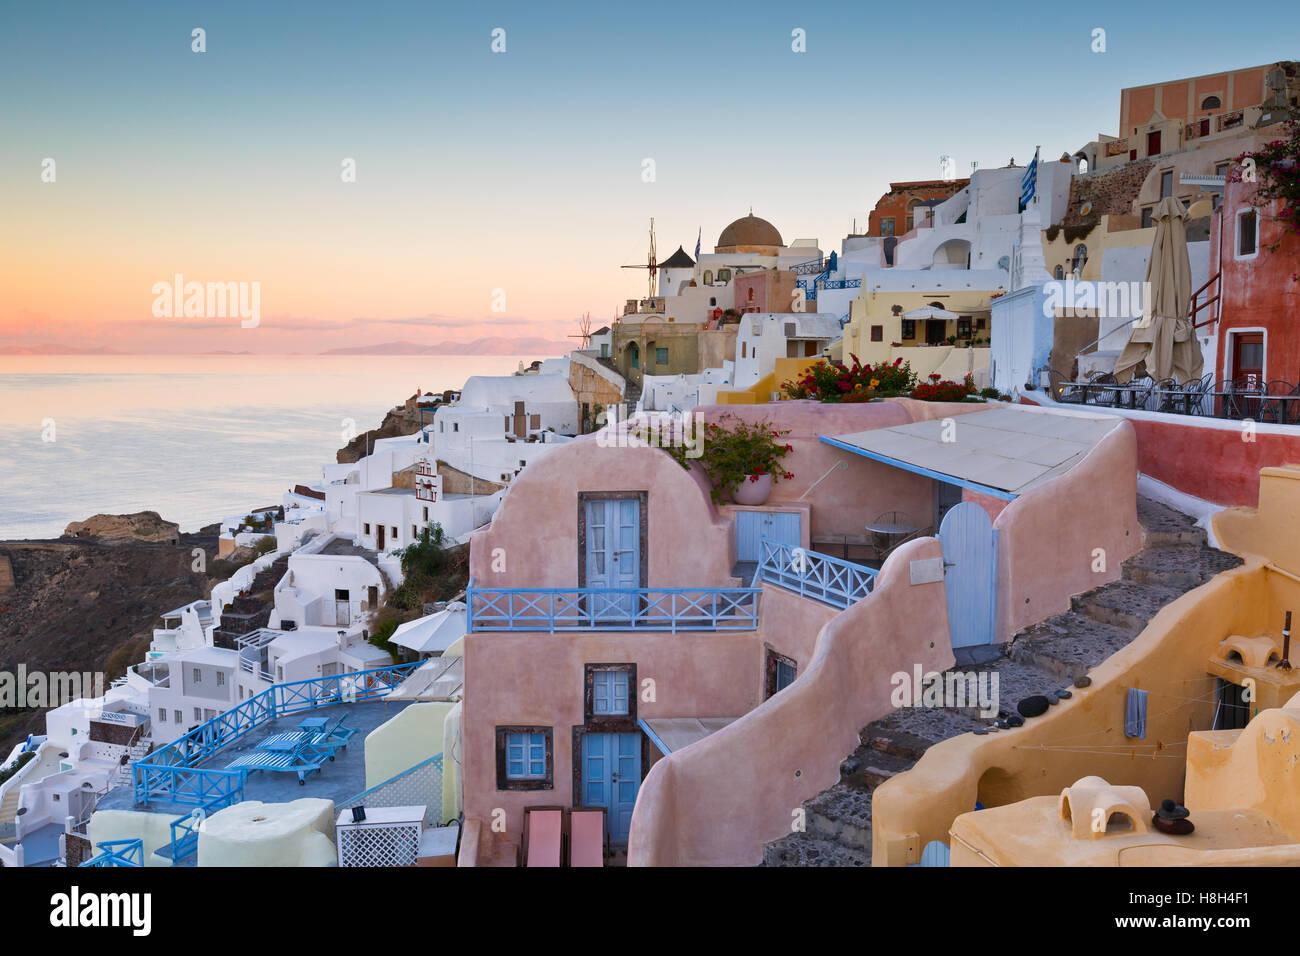 View of Oia village on Santorini island in Greece. - Stock Image